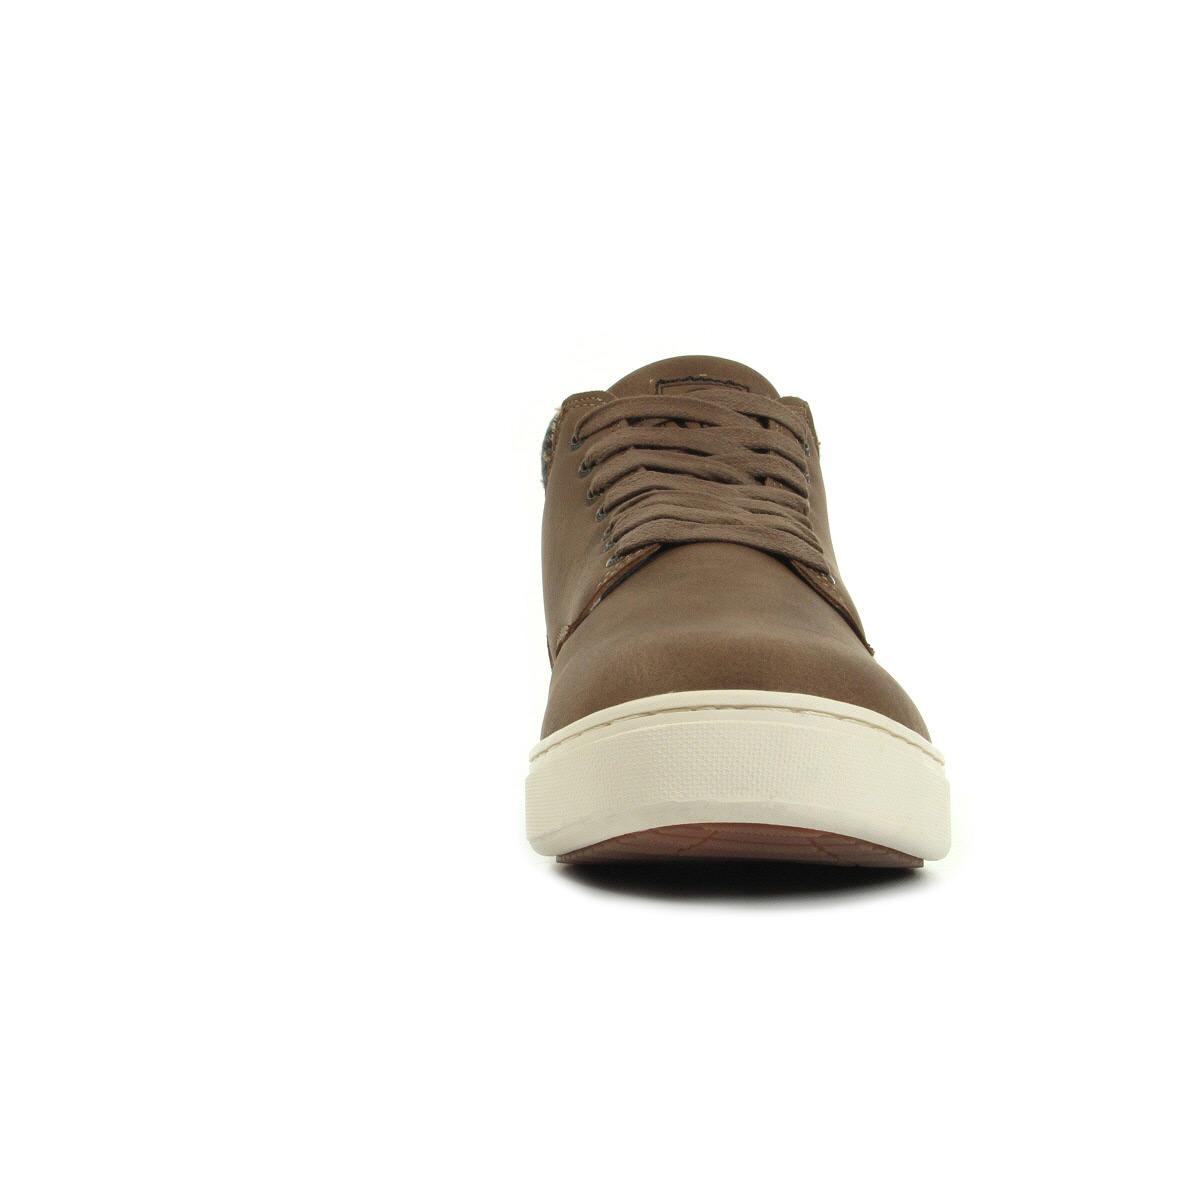 Sergio Tacchini Sancy Ch Bison ST62116202, Boots homme